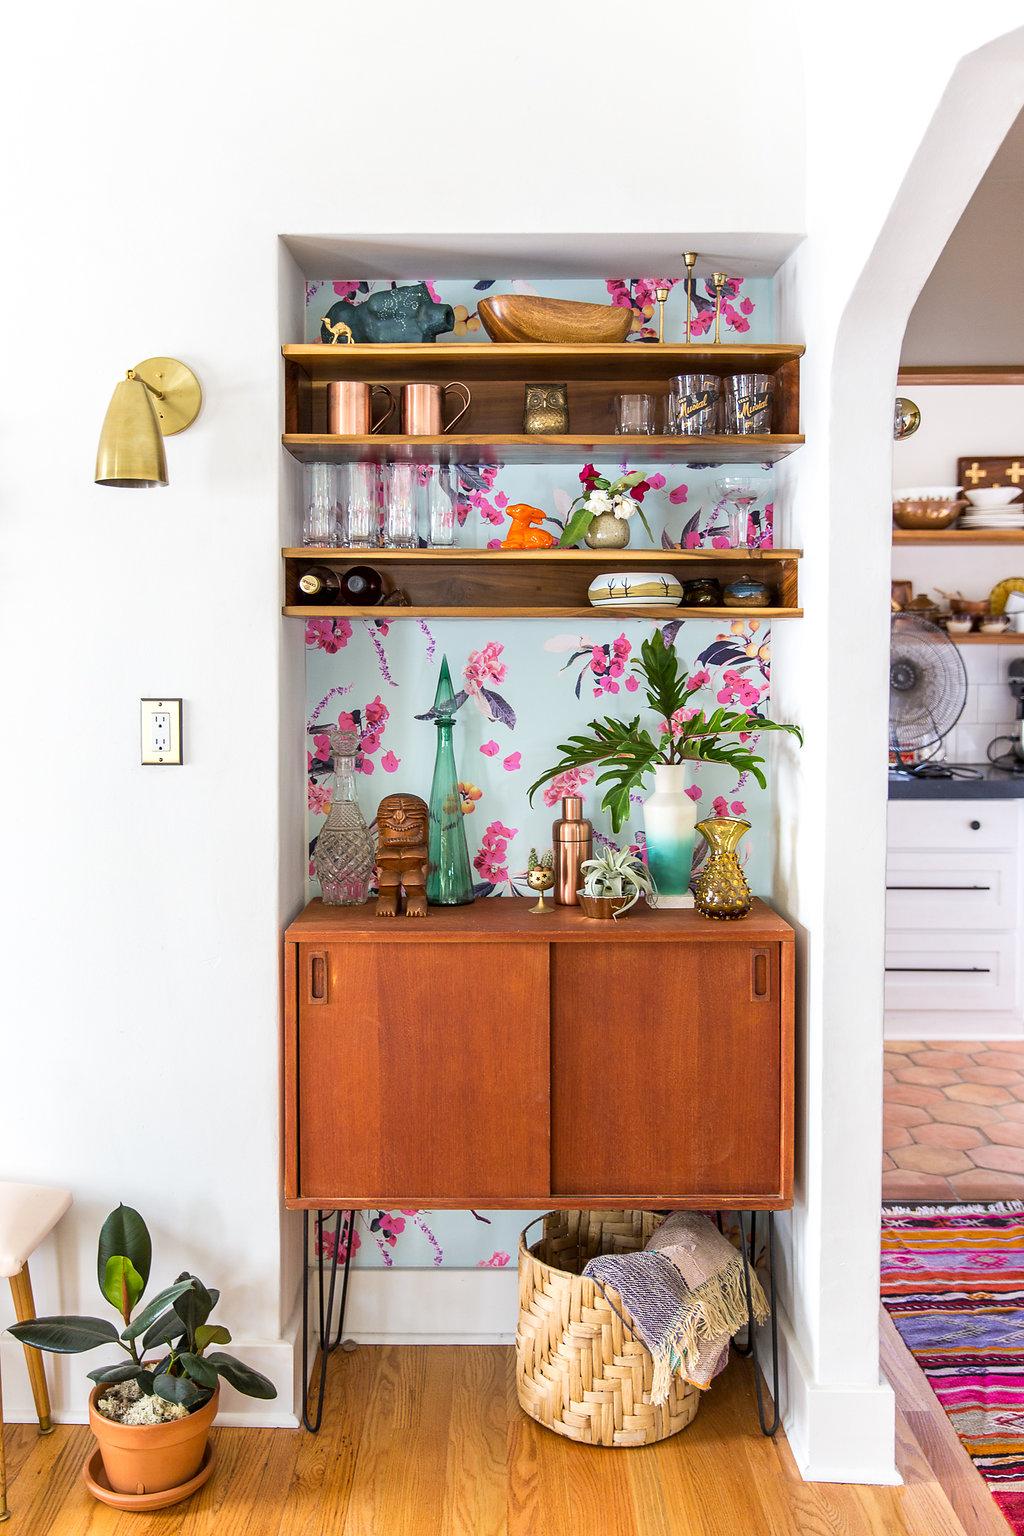 samantha santana wallpaper_apartment therapy feature_marisa vitale